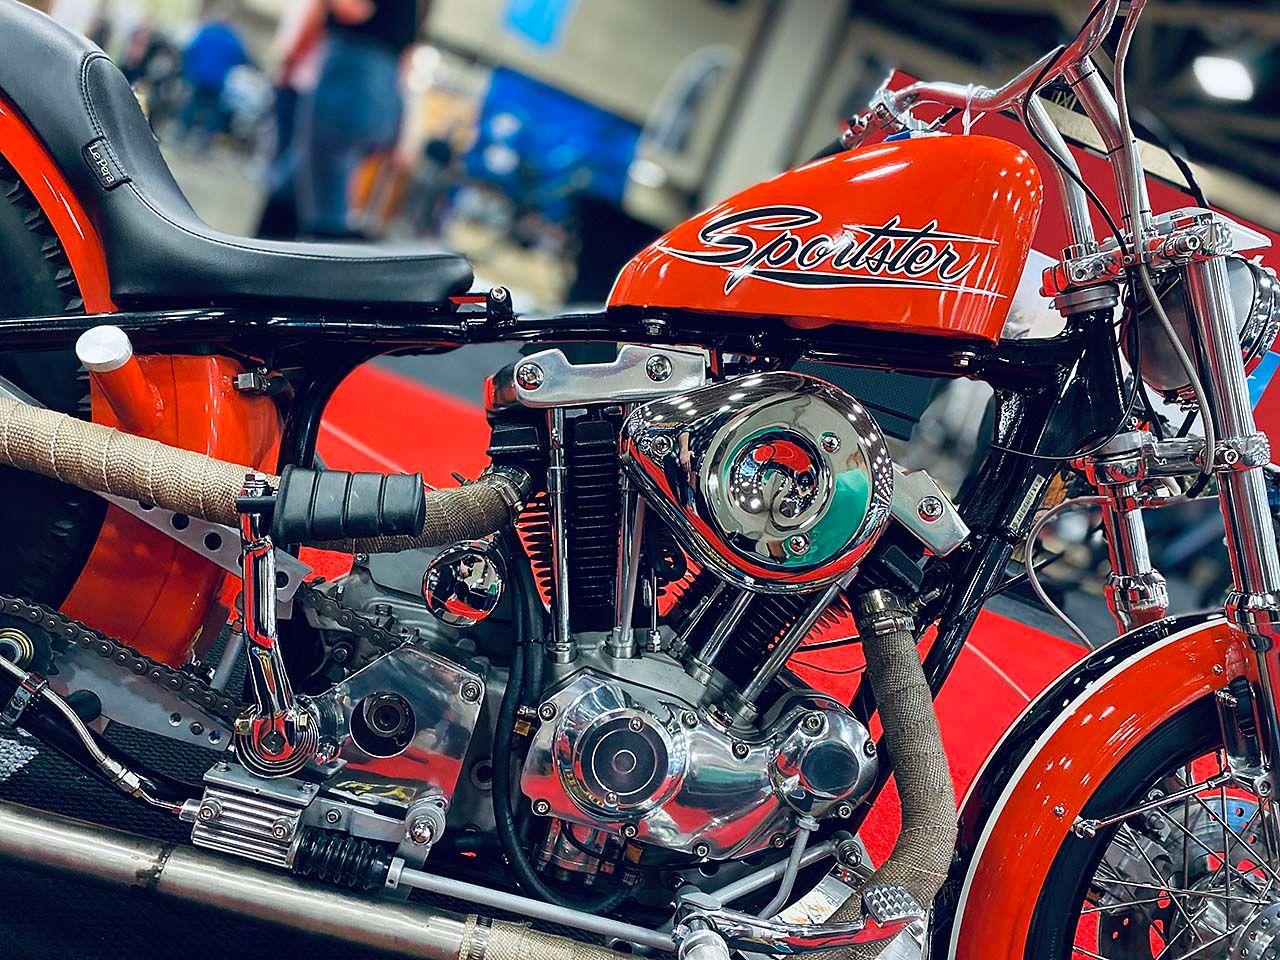 J&P Cycles Ultimate Builder Custom Bike Show Dallas Winners